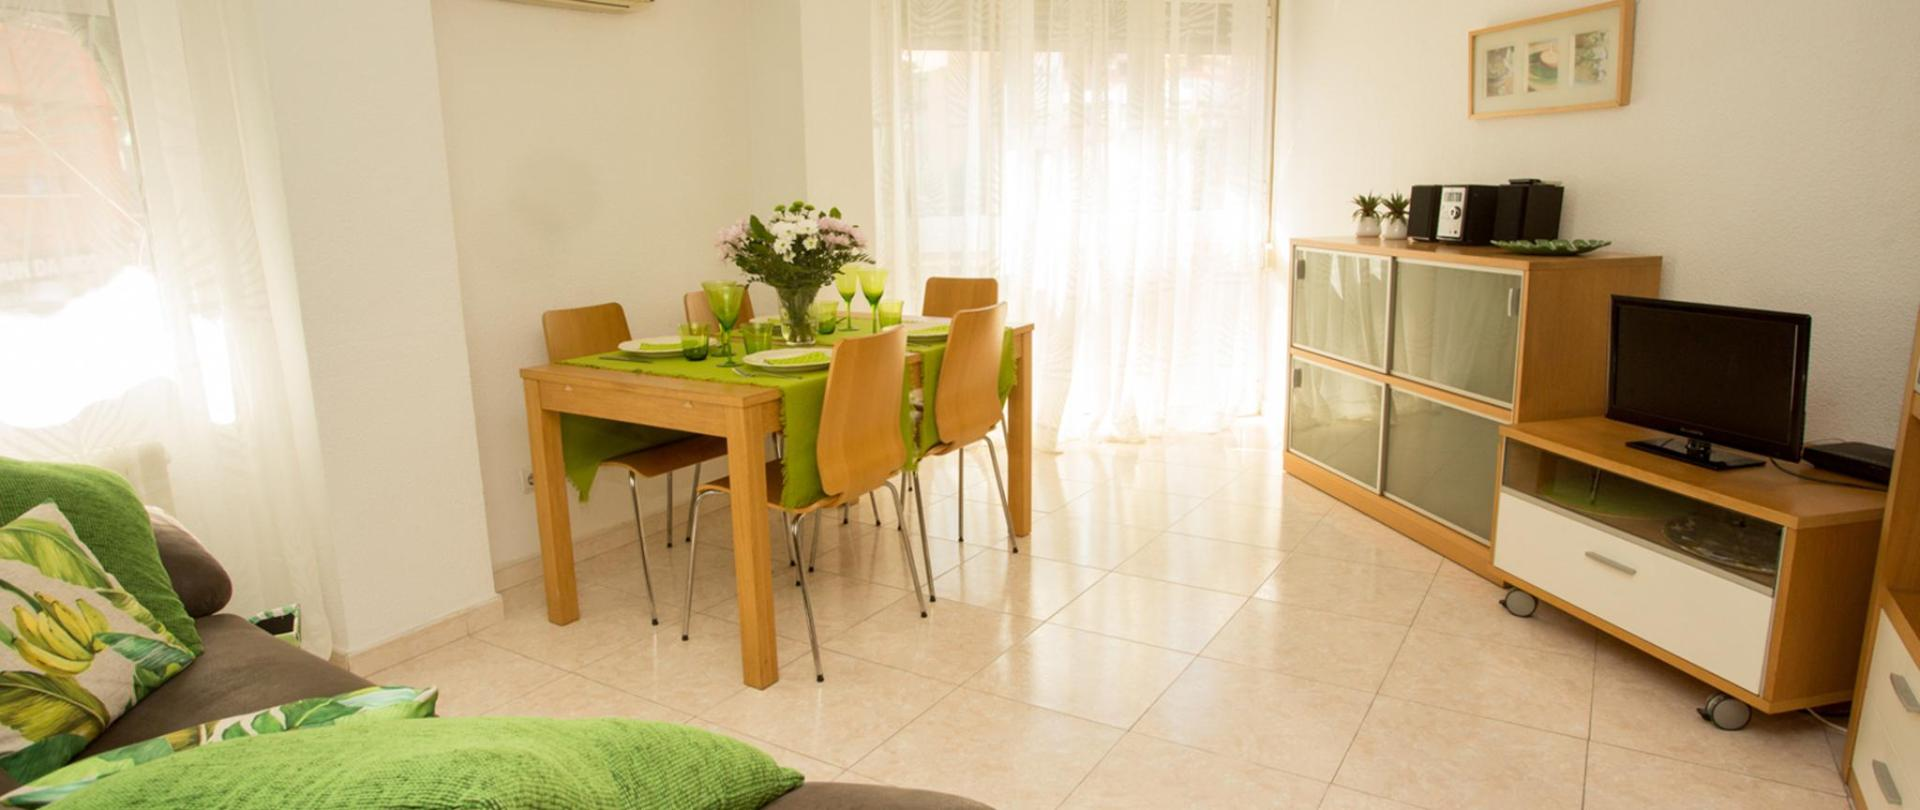 Modern & Cozy Apartment in Alicante City